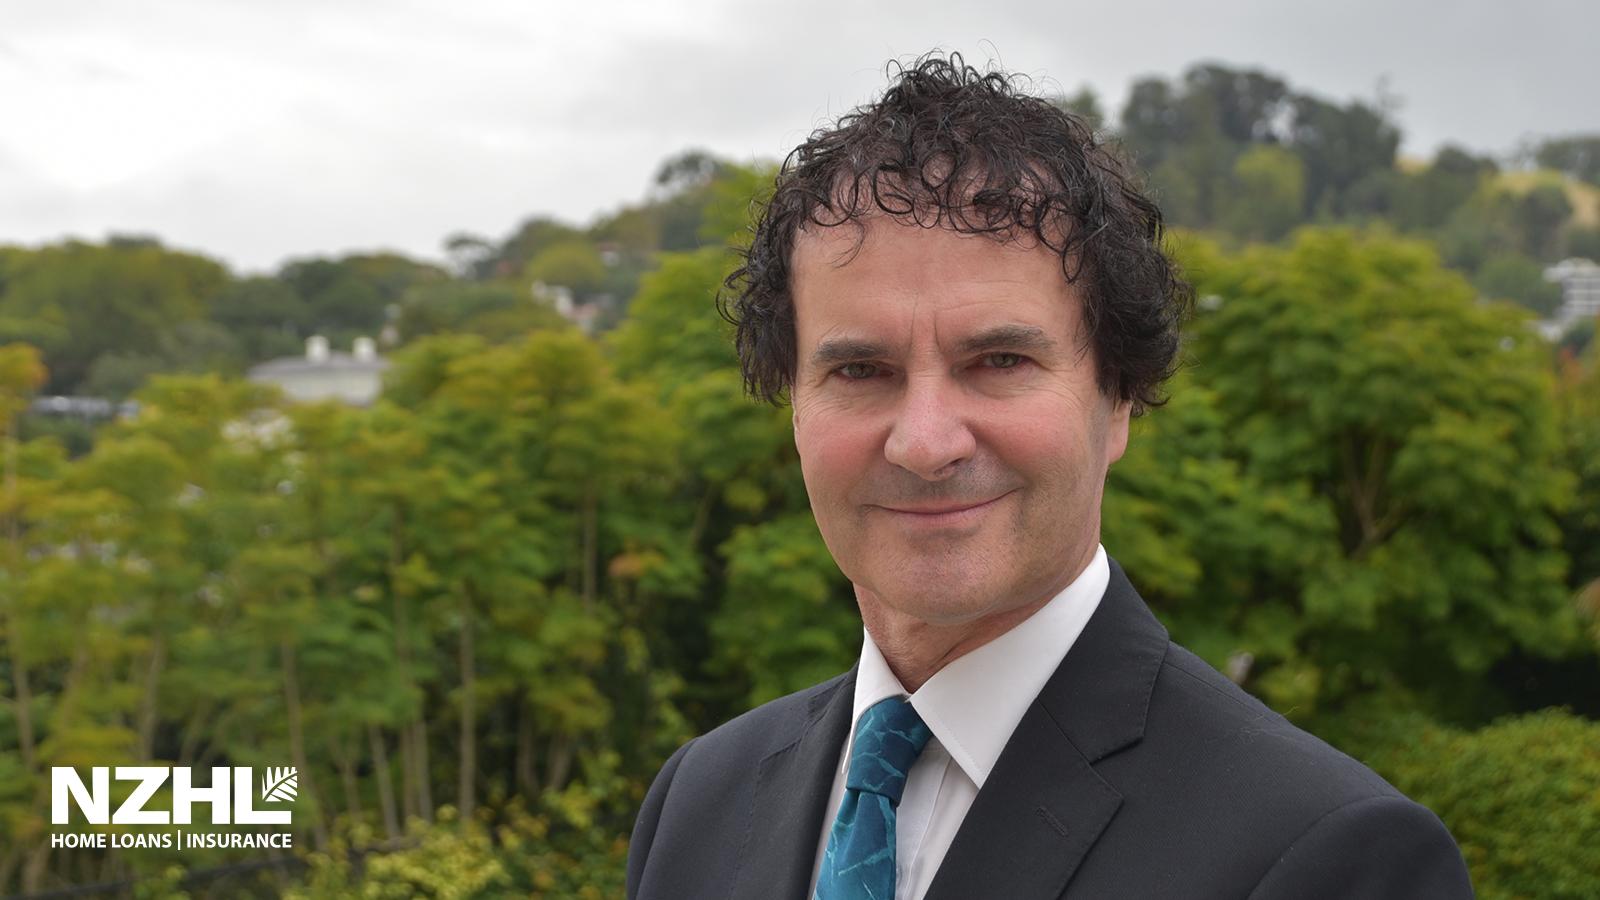 Tony Alexander | The Economic Bounce Back | NZHL Thumbnail